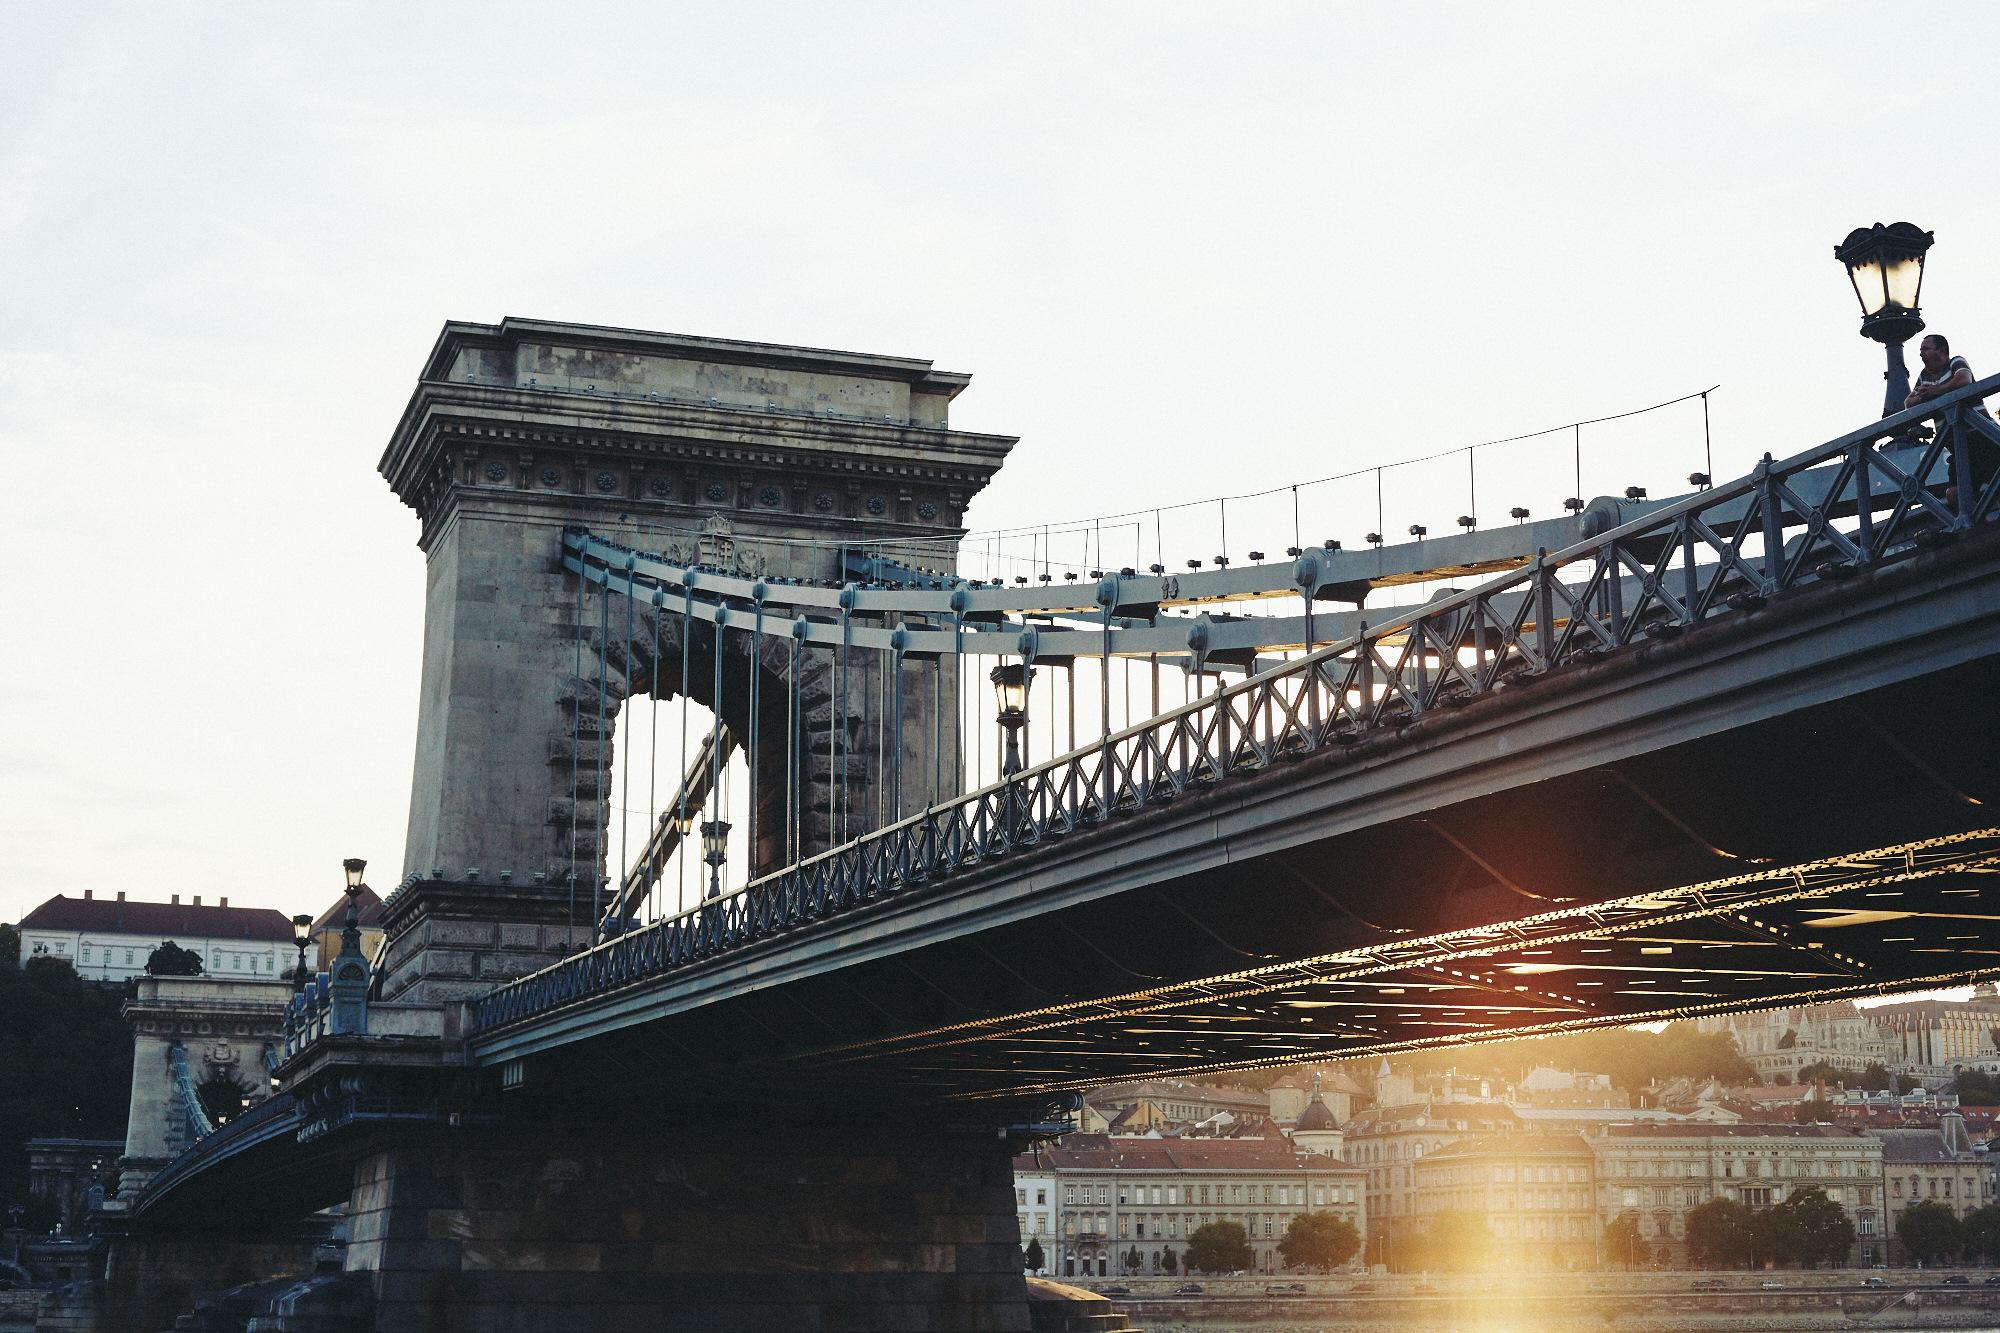 maxmotel_budapest_aug2015_day01_06_danube_bridge_0276